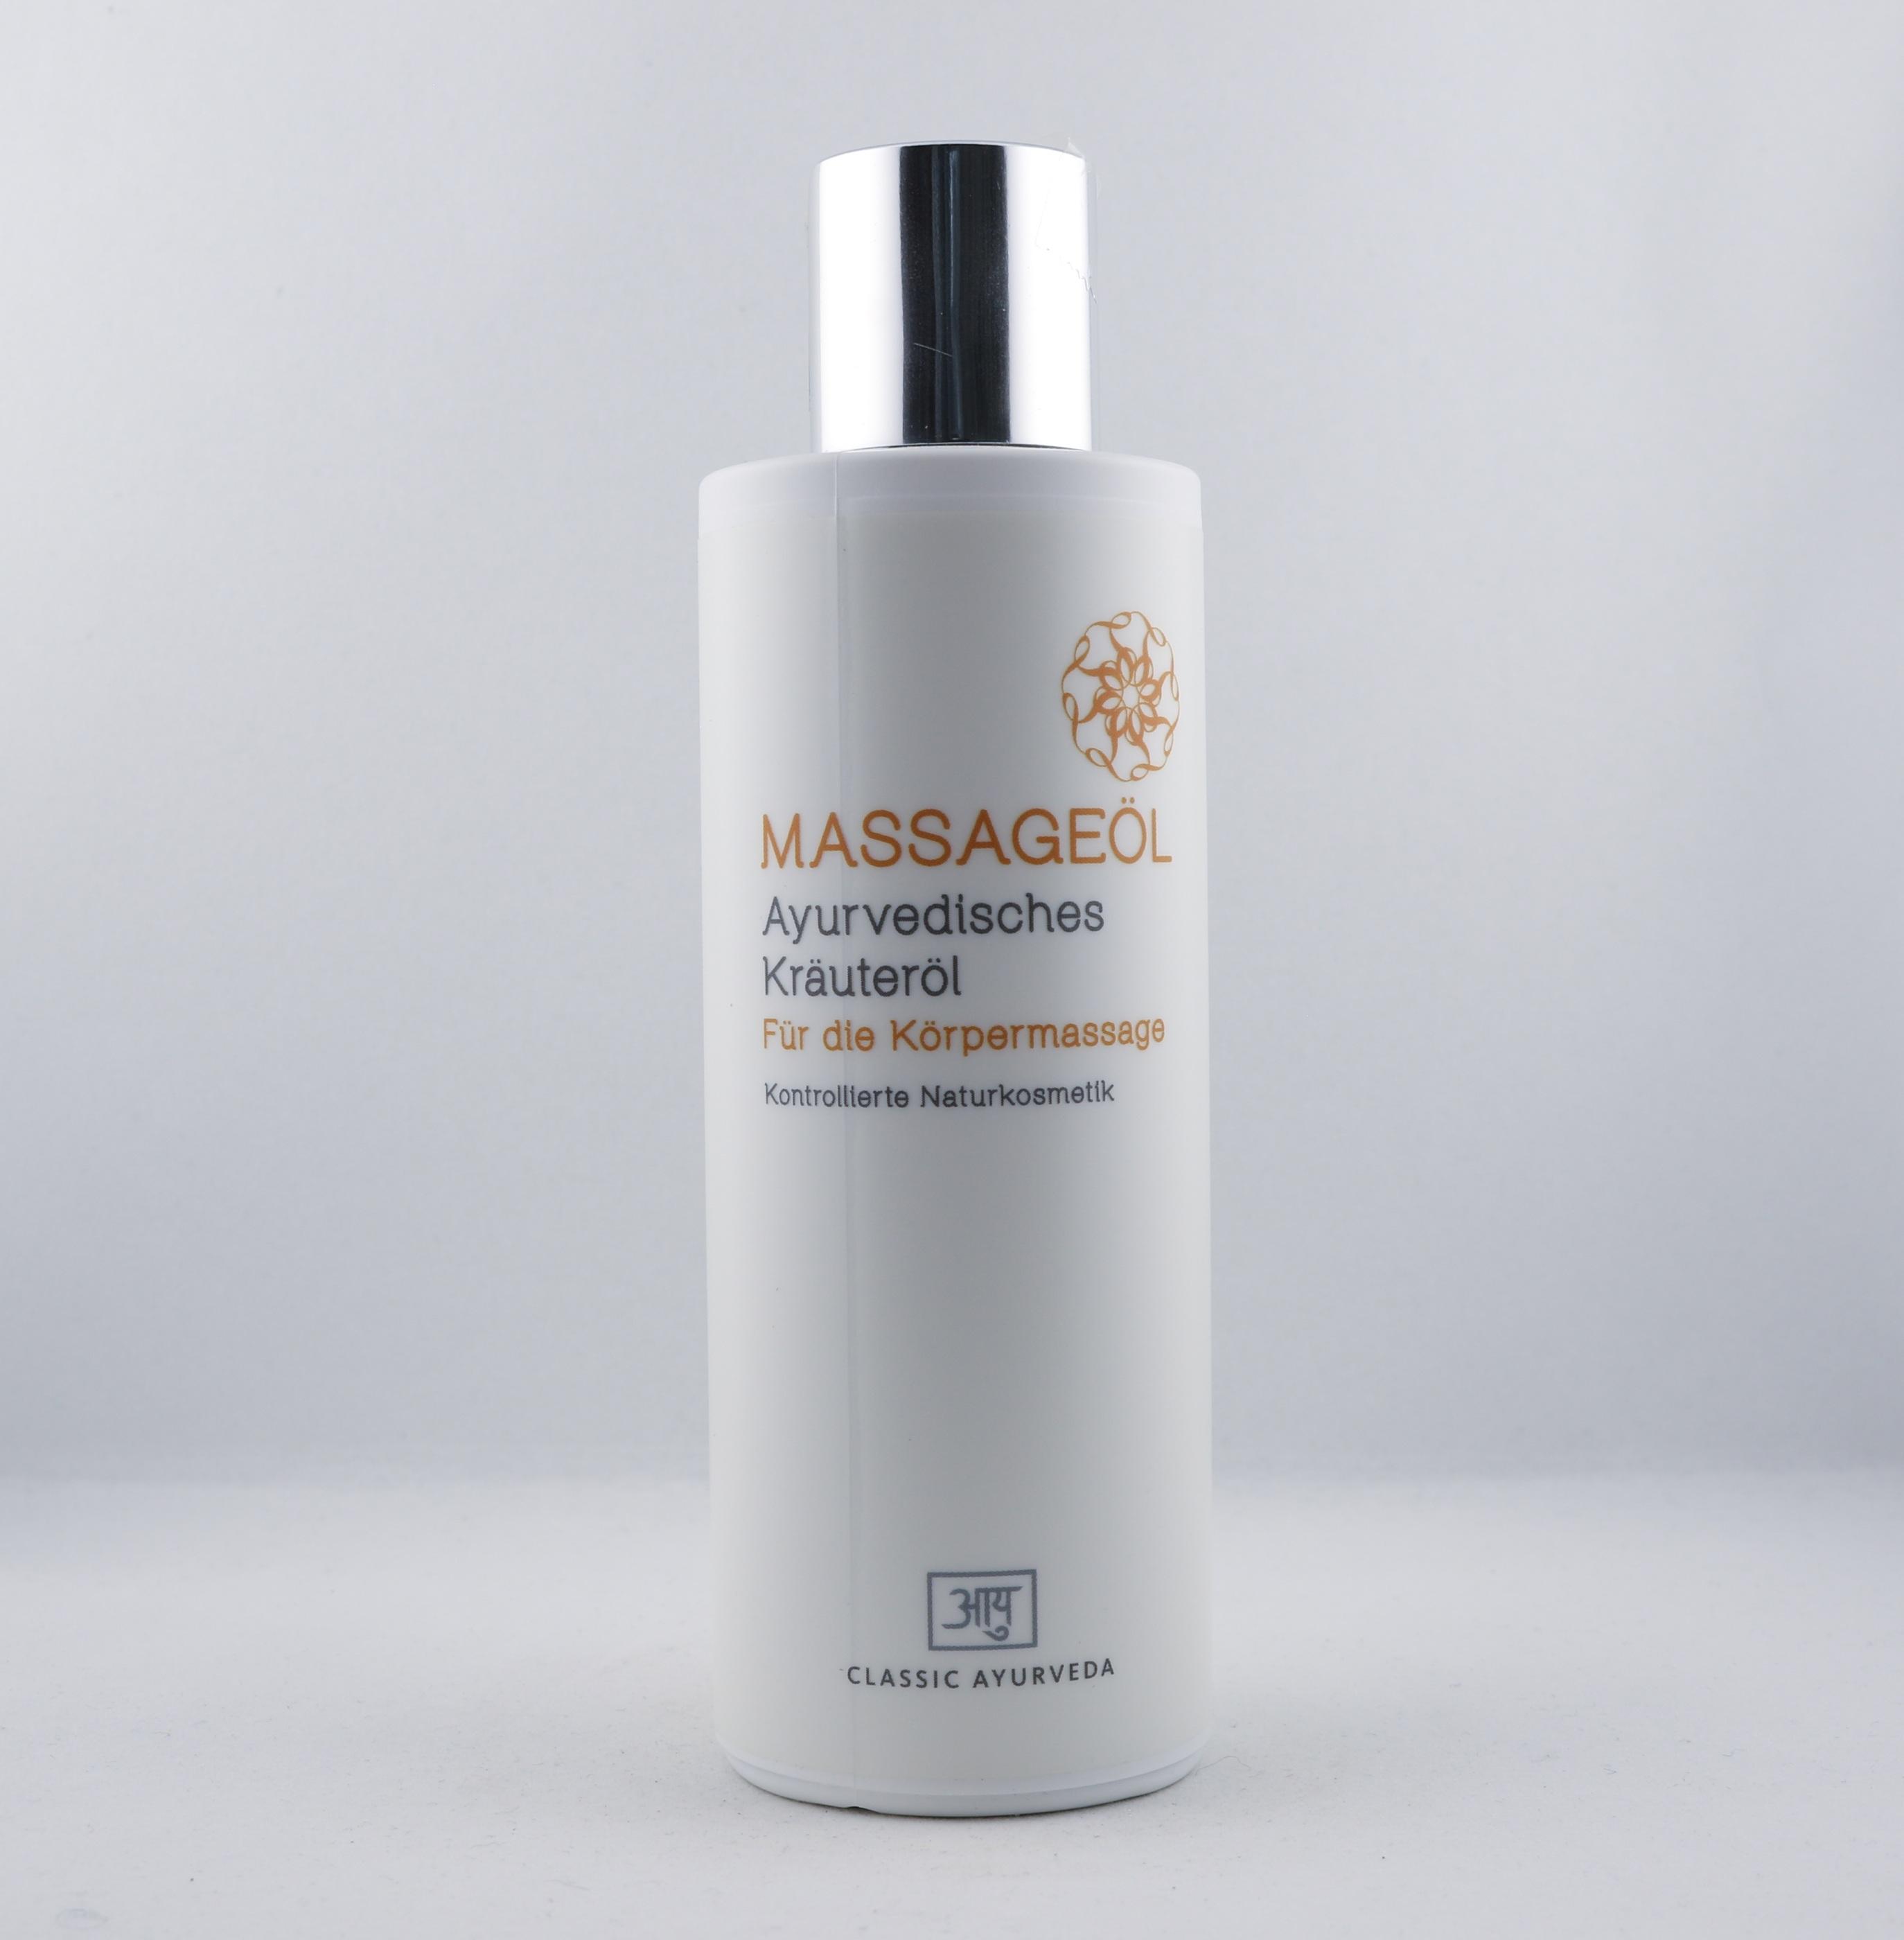 Massage olja wellness ayurveda halmstad sweden svensk hudvård